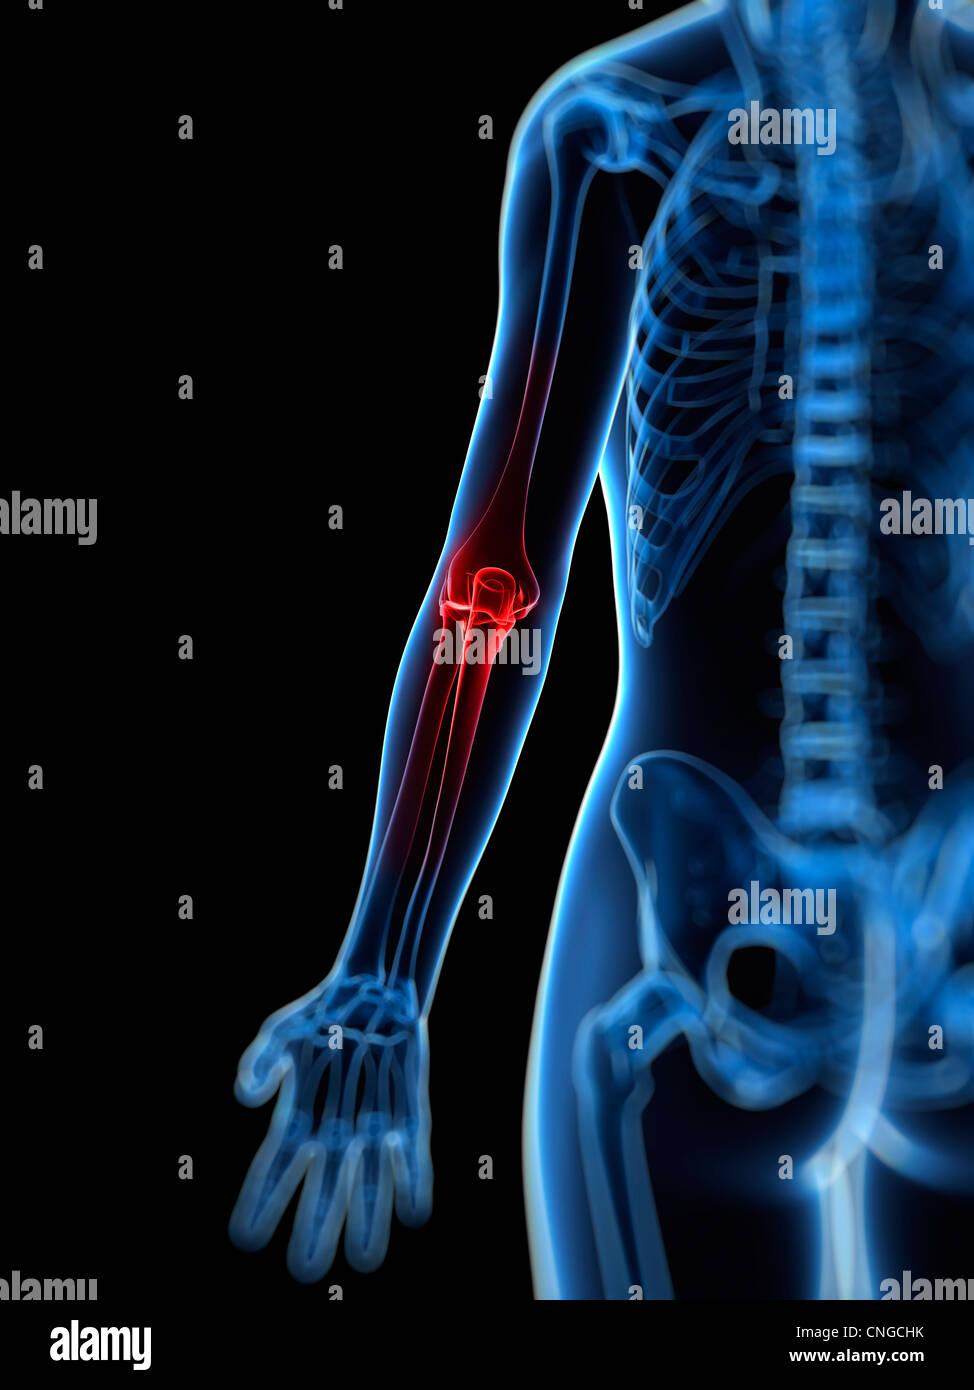 Human Elbow Joint Pain Stock Photos & Human Elbow Joint Pain Stock ...